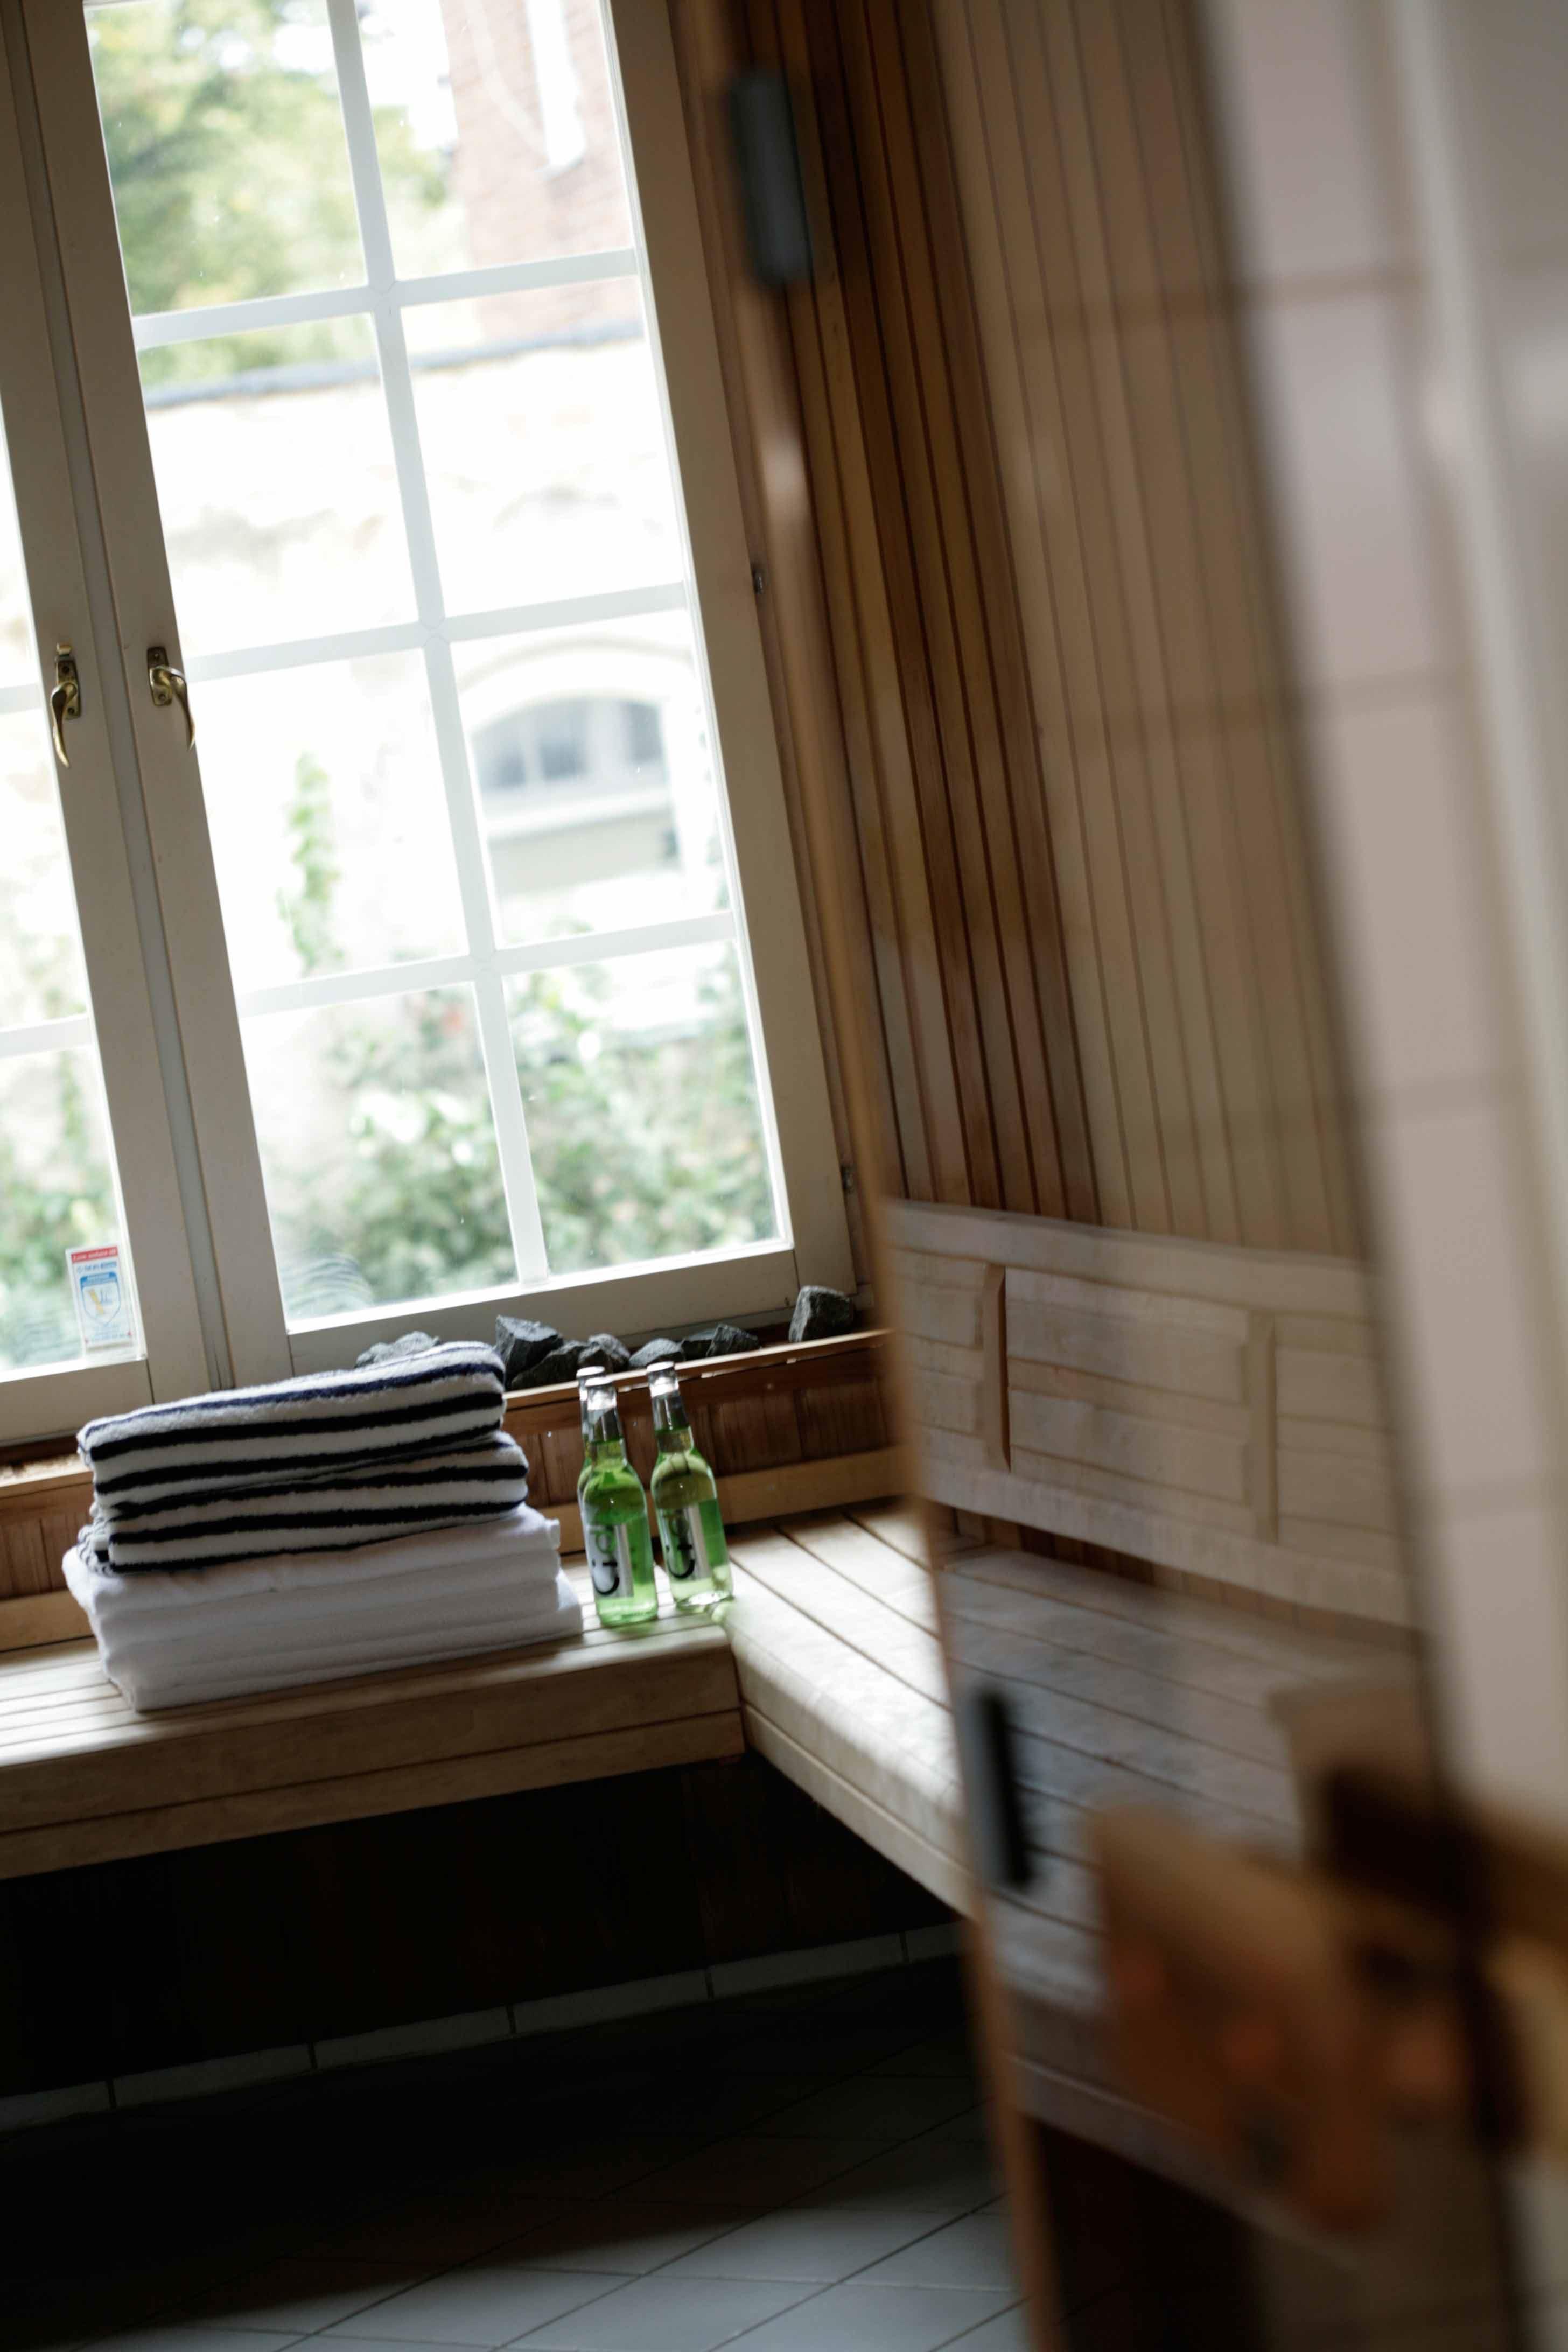 Hotel Restaurang Dannegården